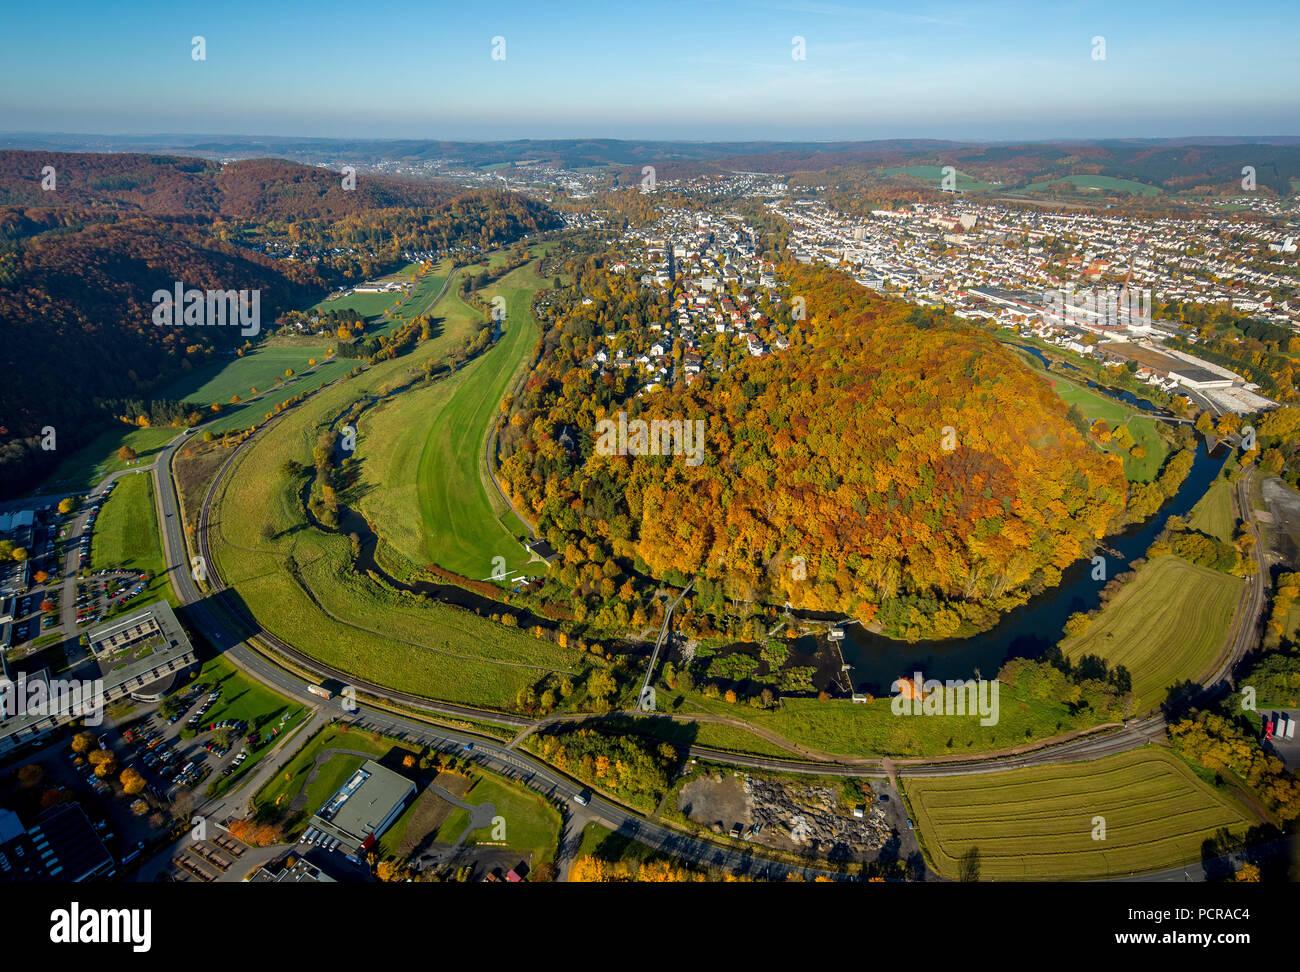 Into Ruhr River Stockfotos & Into Ruhr River Bilder - Seite 8 - Alamy